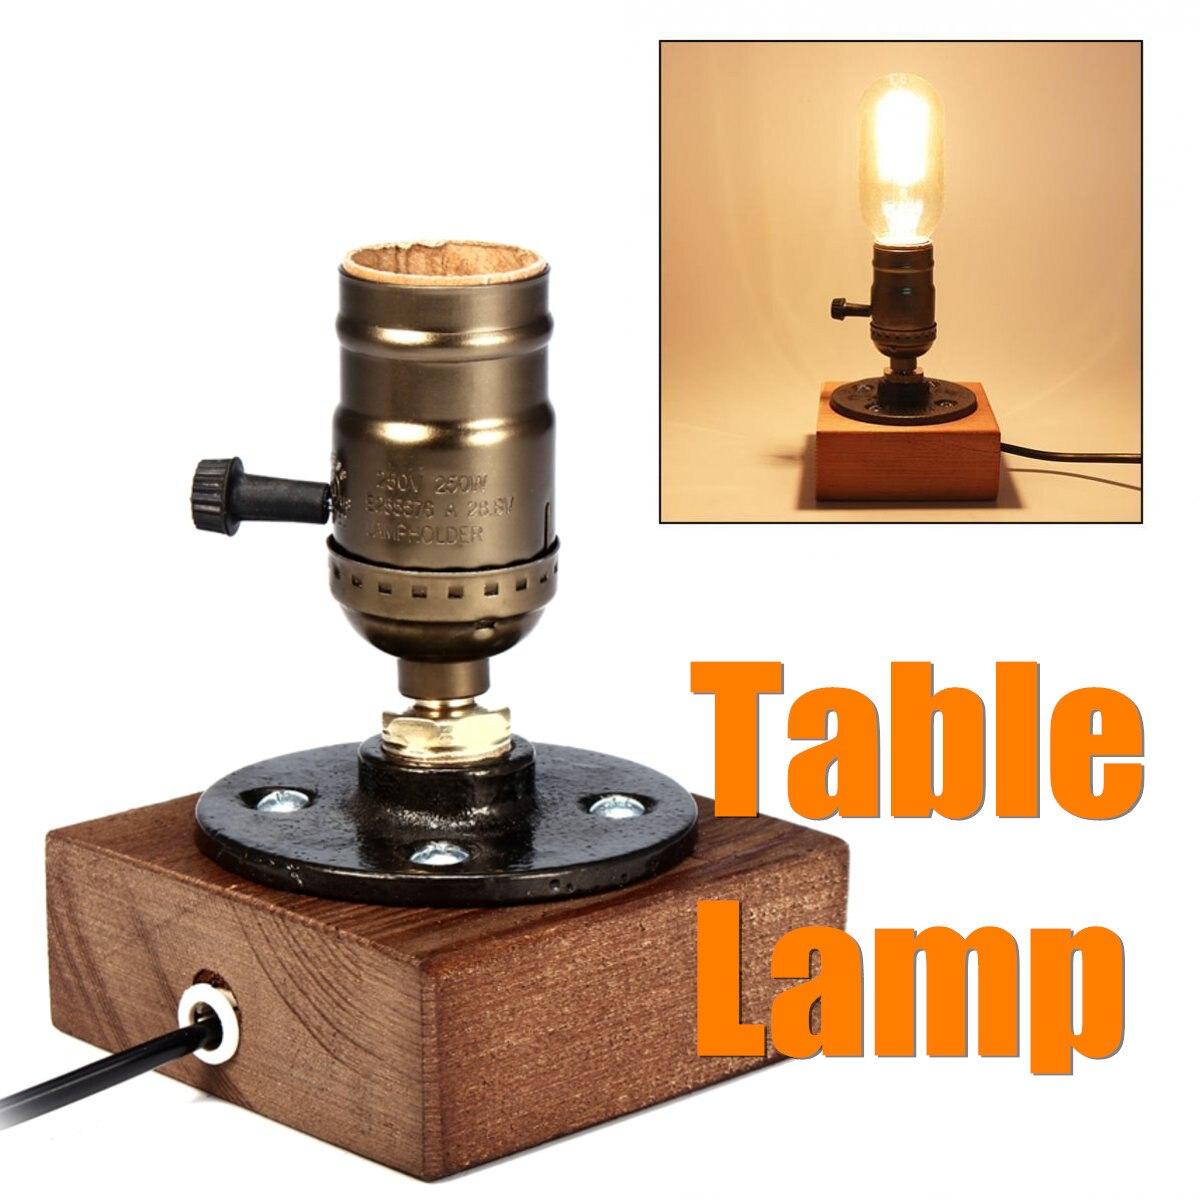 De Madera eléctrica Retro clásico escritorio cabecera lámpara de mesa para de noche lámpara de estudio Bar Café iluminación para tienda de iluminación interior suministros E27